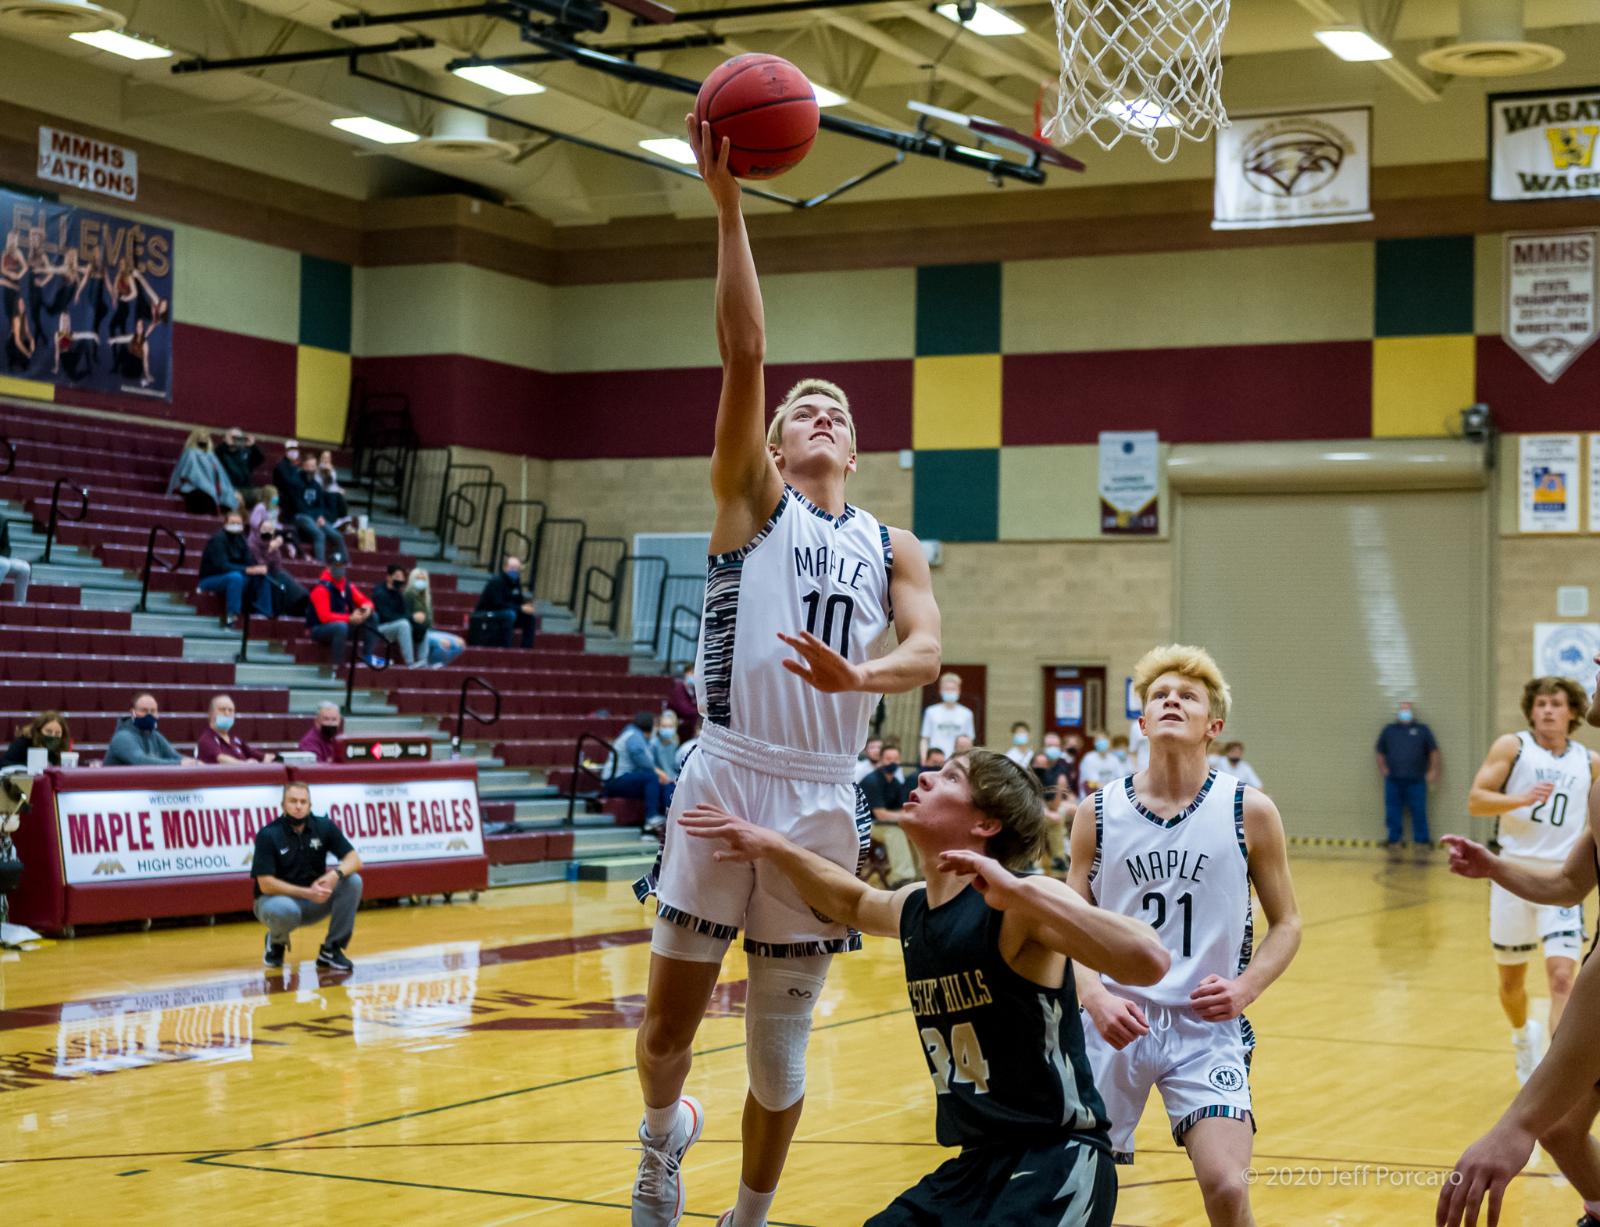 Gallery: Basketball Boys Varsity Desert Hills 2020